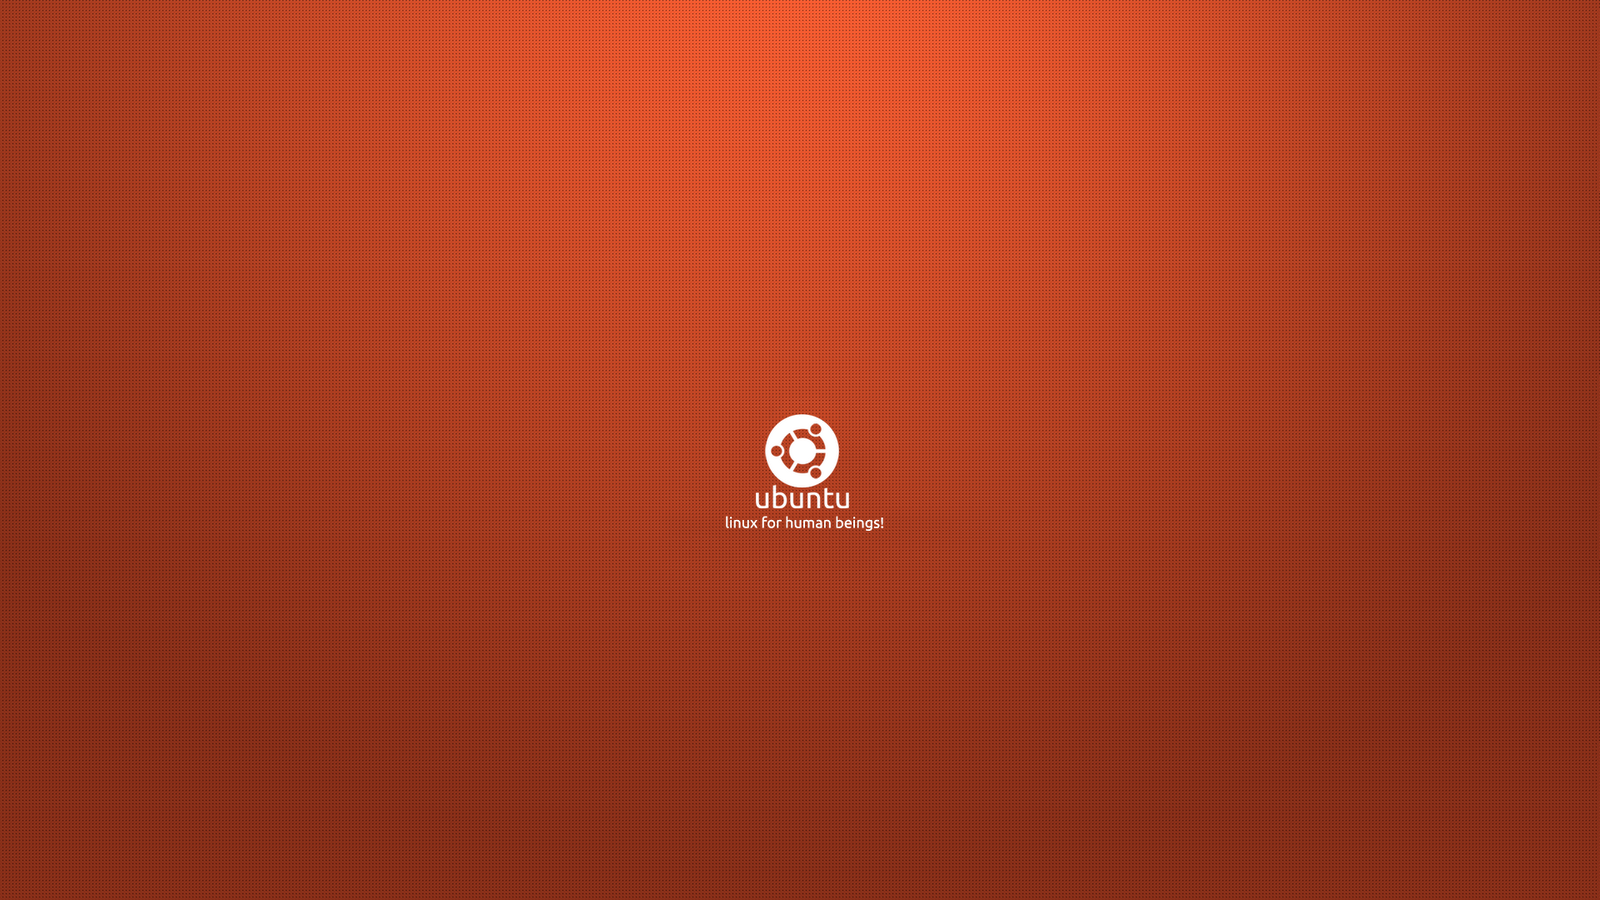 Cute HD Pictures Wallpaper Ubuntu 1204 1600x900